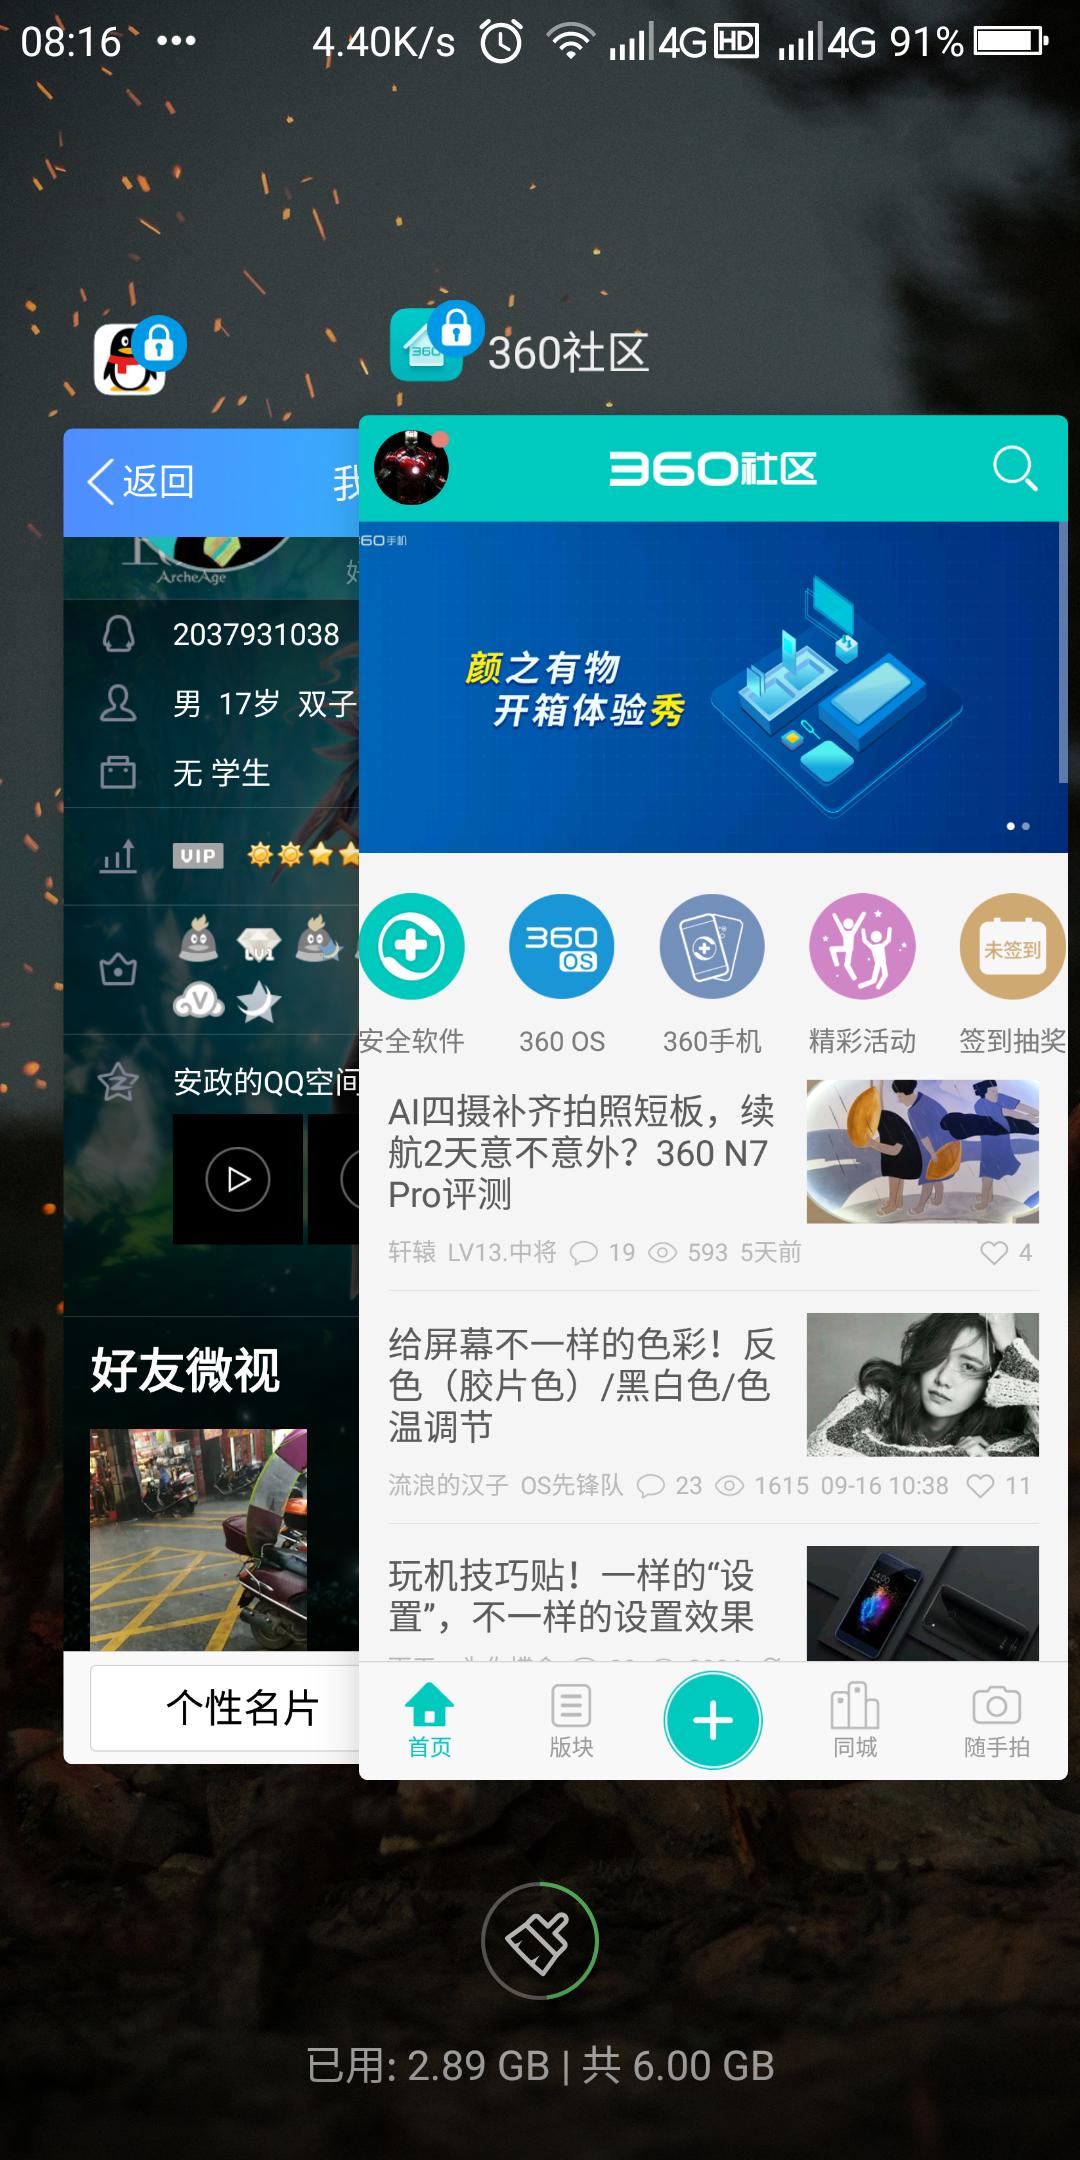 Screenshot_2018-09-27-08-16-59.png